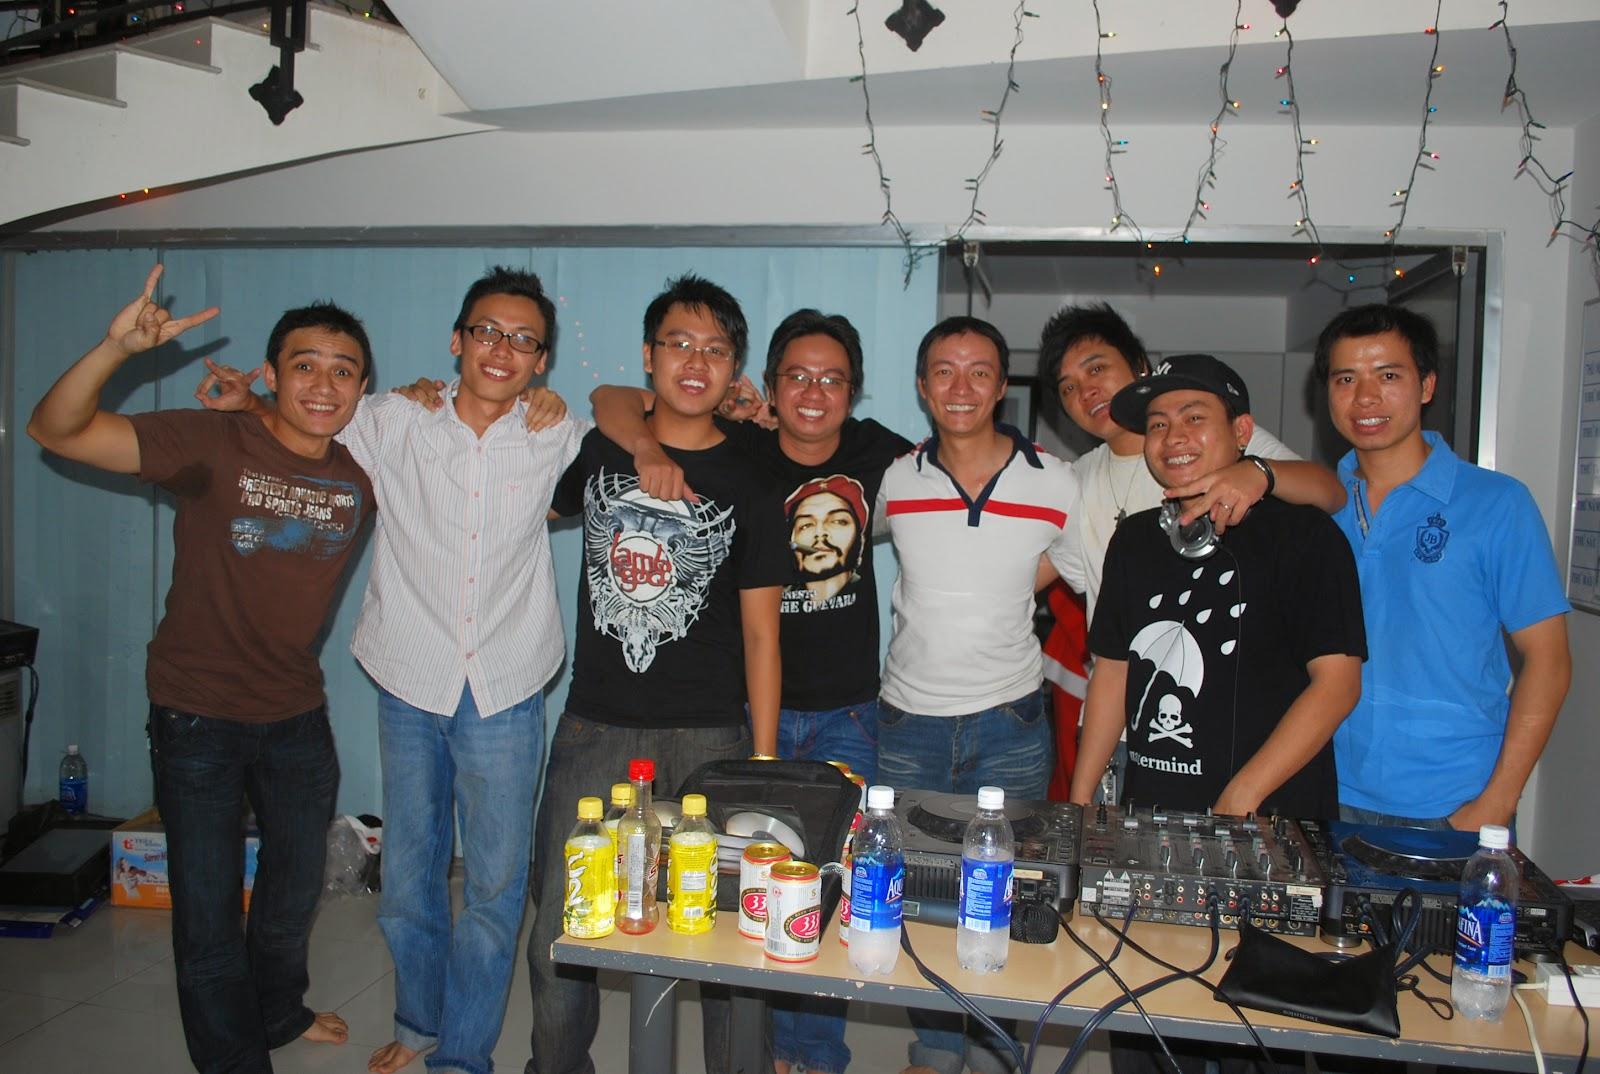 hoi-ngo-yan-staff-yeuamnhac-www.c10mt.com